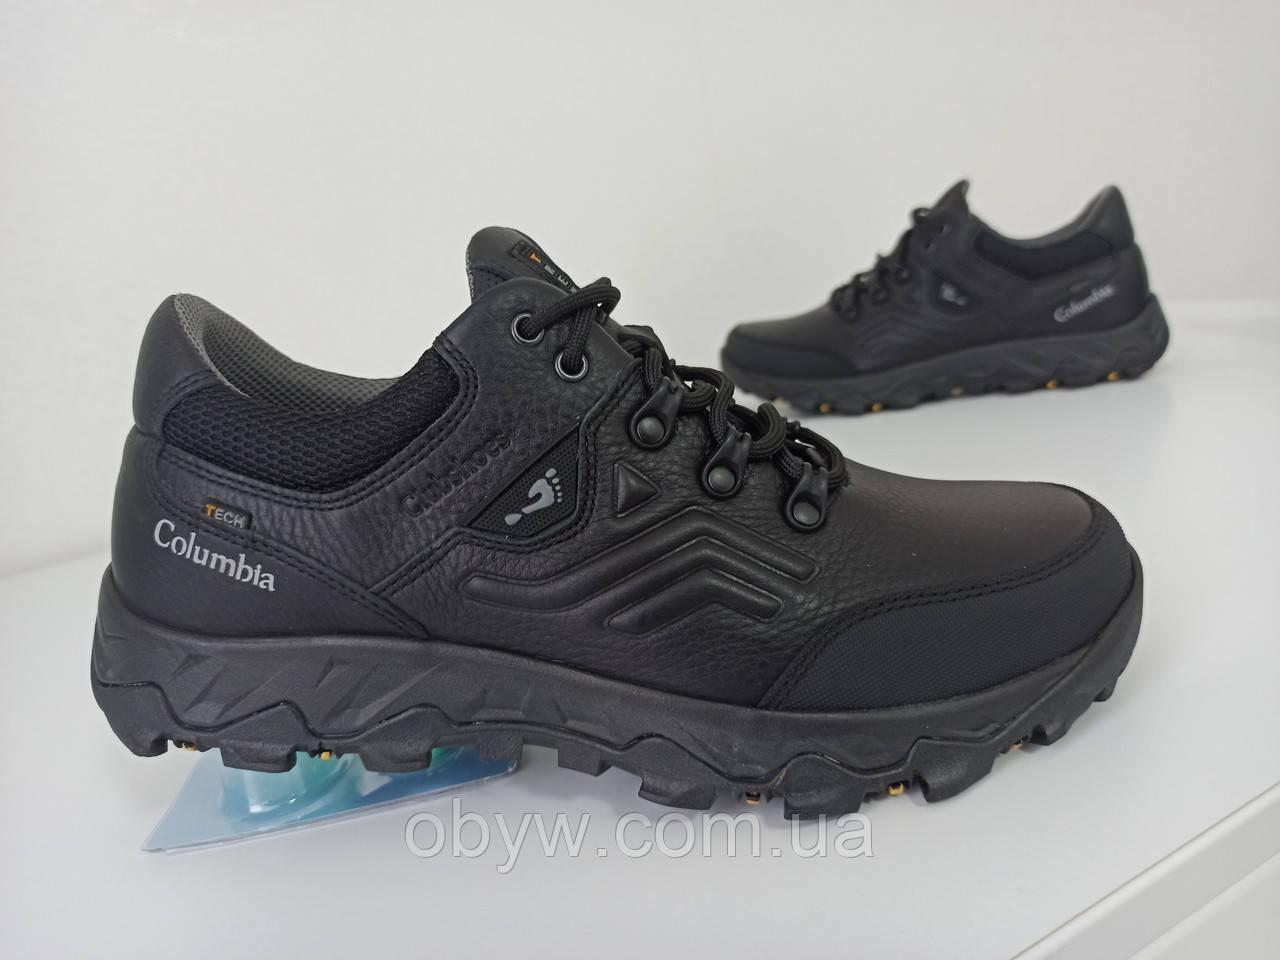 Кожаная мужская обувь demi sizon 40-45 shoes.